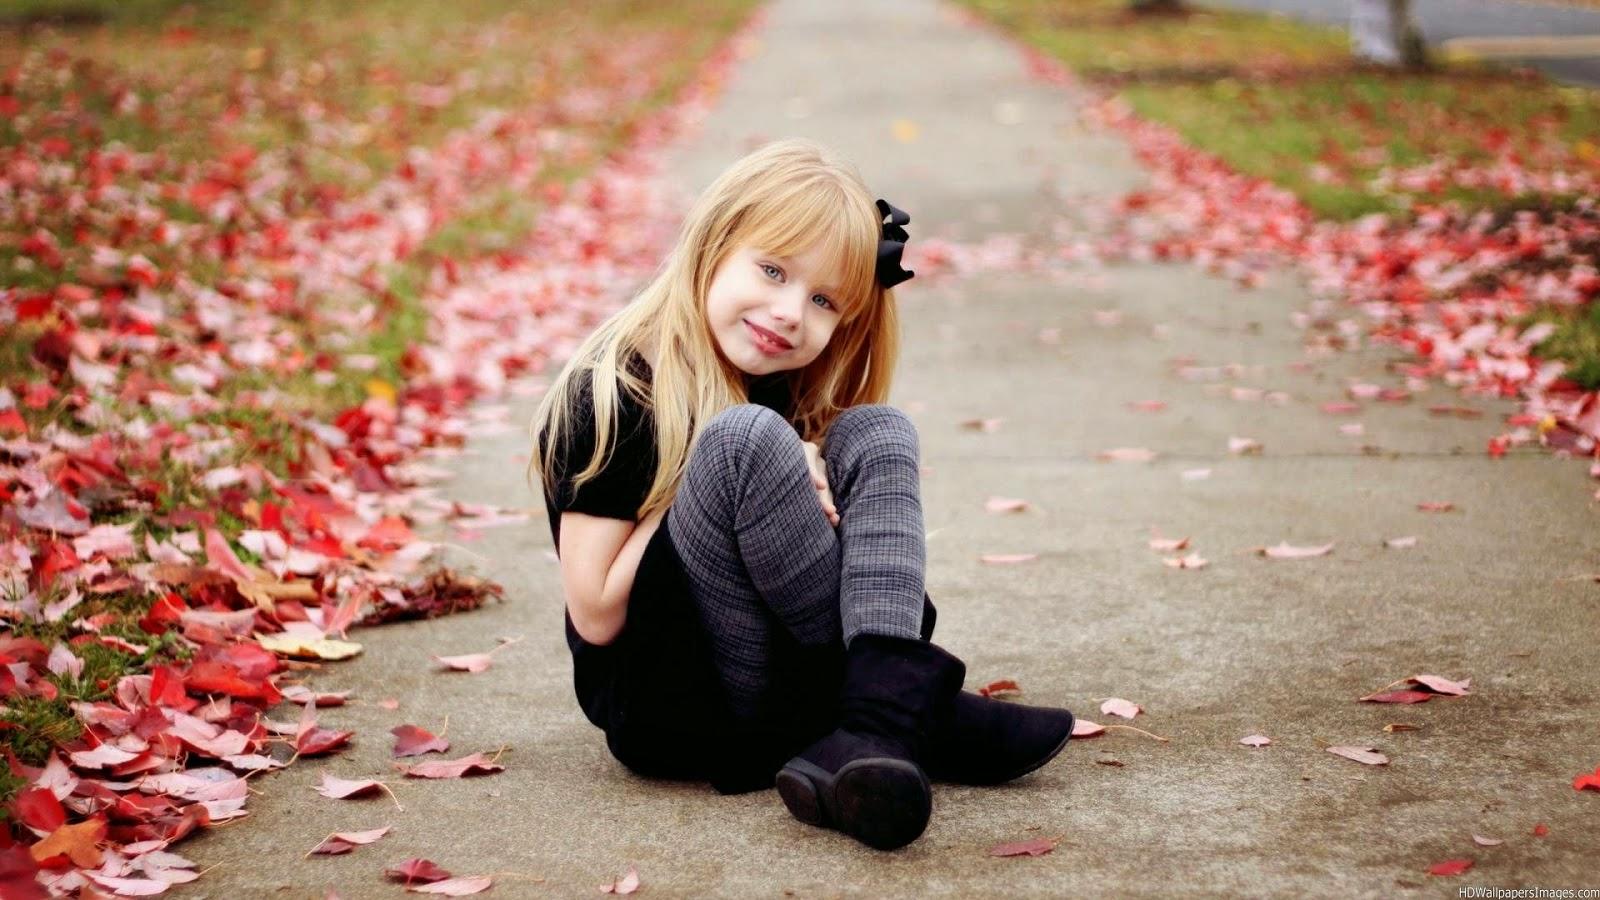 Jango Wallpapers: Most Beautiful Smiling Baby Girls HD Pics